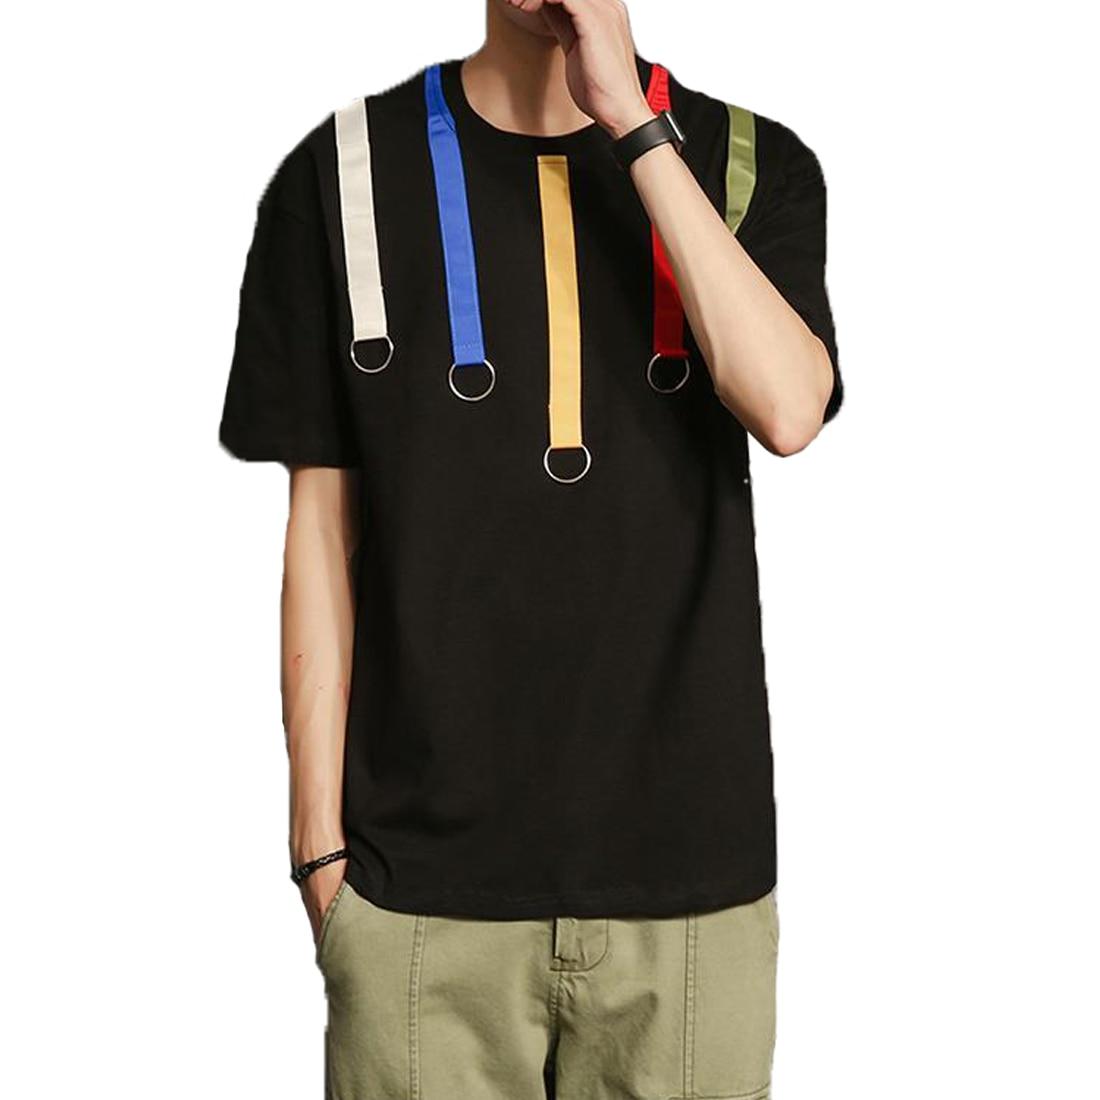 Black t shirt white collar - Stylish Hip Hop T Shirt Men Round Collar Short Sleeve Summer T Shirt Belts Patchwork Plus Size Black White Tshirt Mens Pullovers